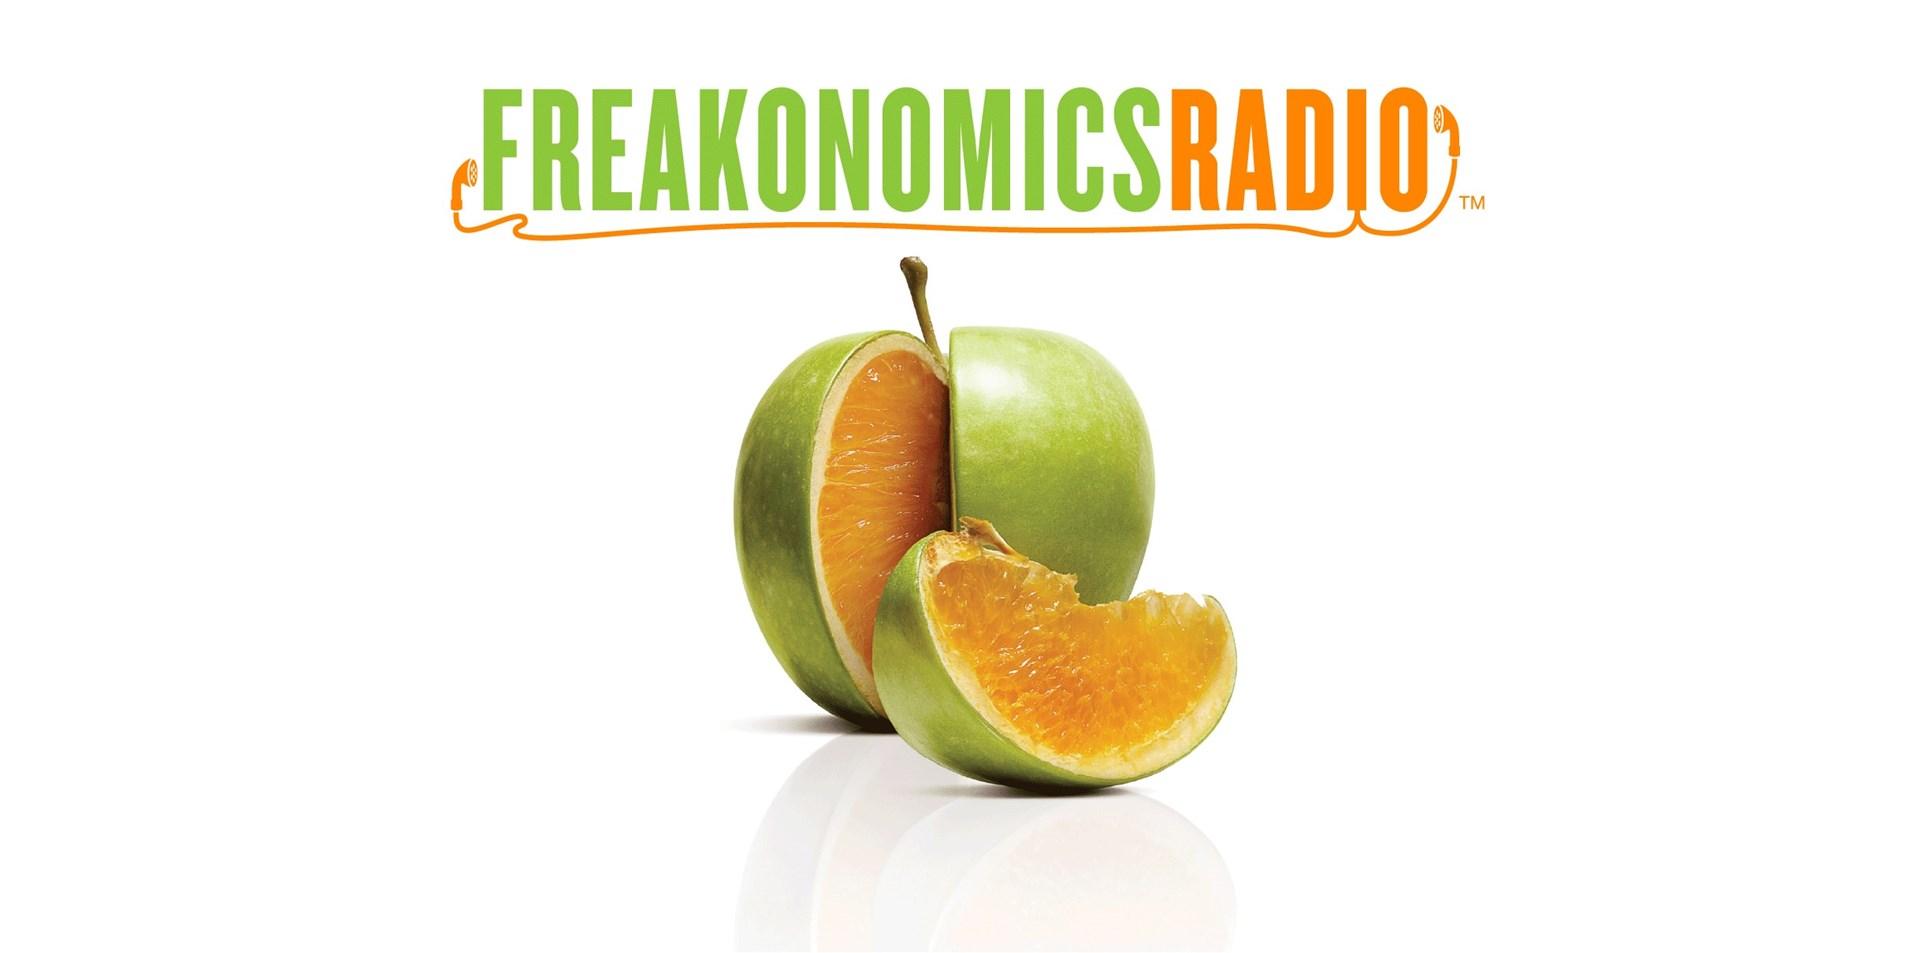 listen to i pencil on freakonomics radio   foundation for  listen to i pencil on freakonomics radio